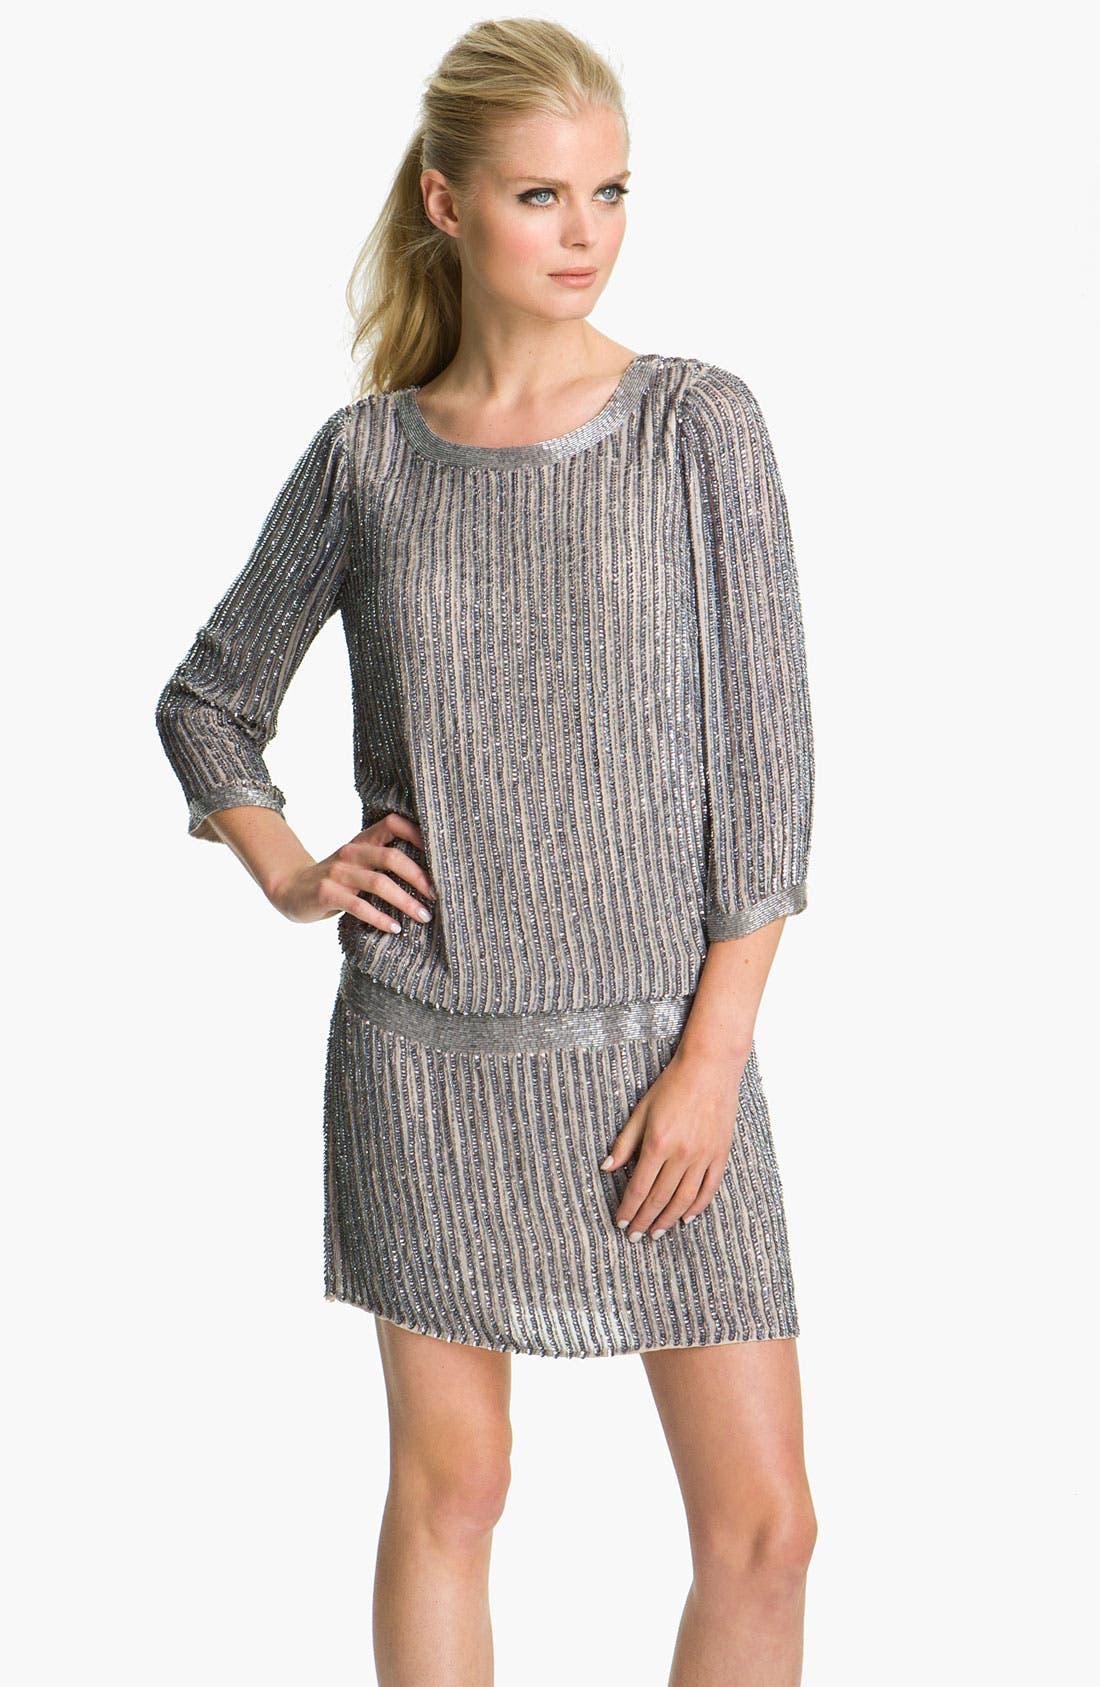 Alternate Image 1 Selected - Adrianna Papell Scoop Back Embellished Silk Blouson Dress